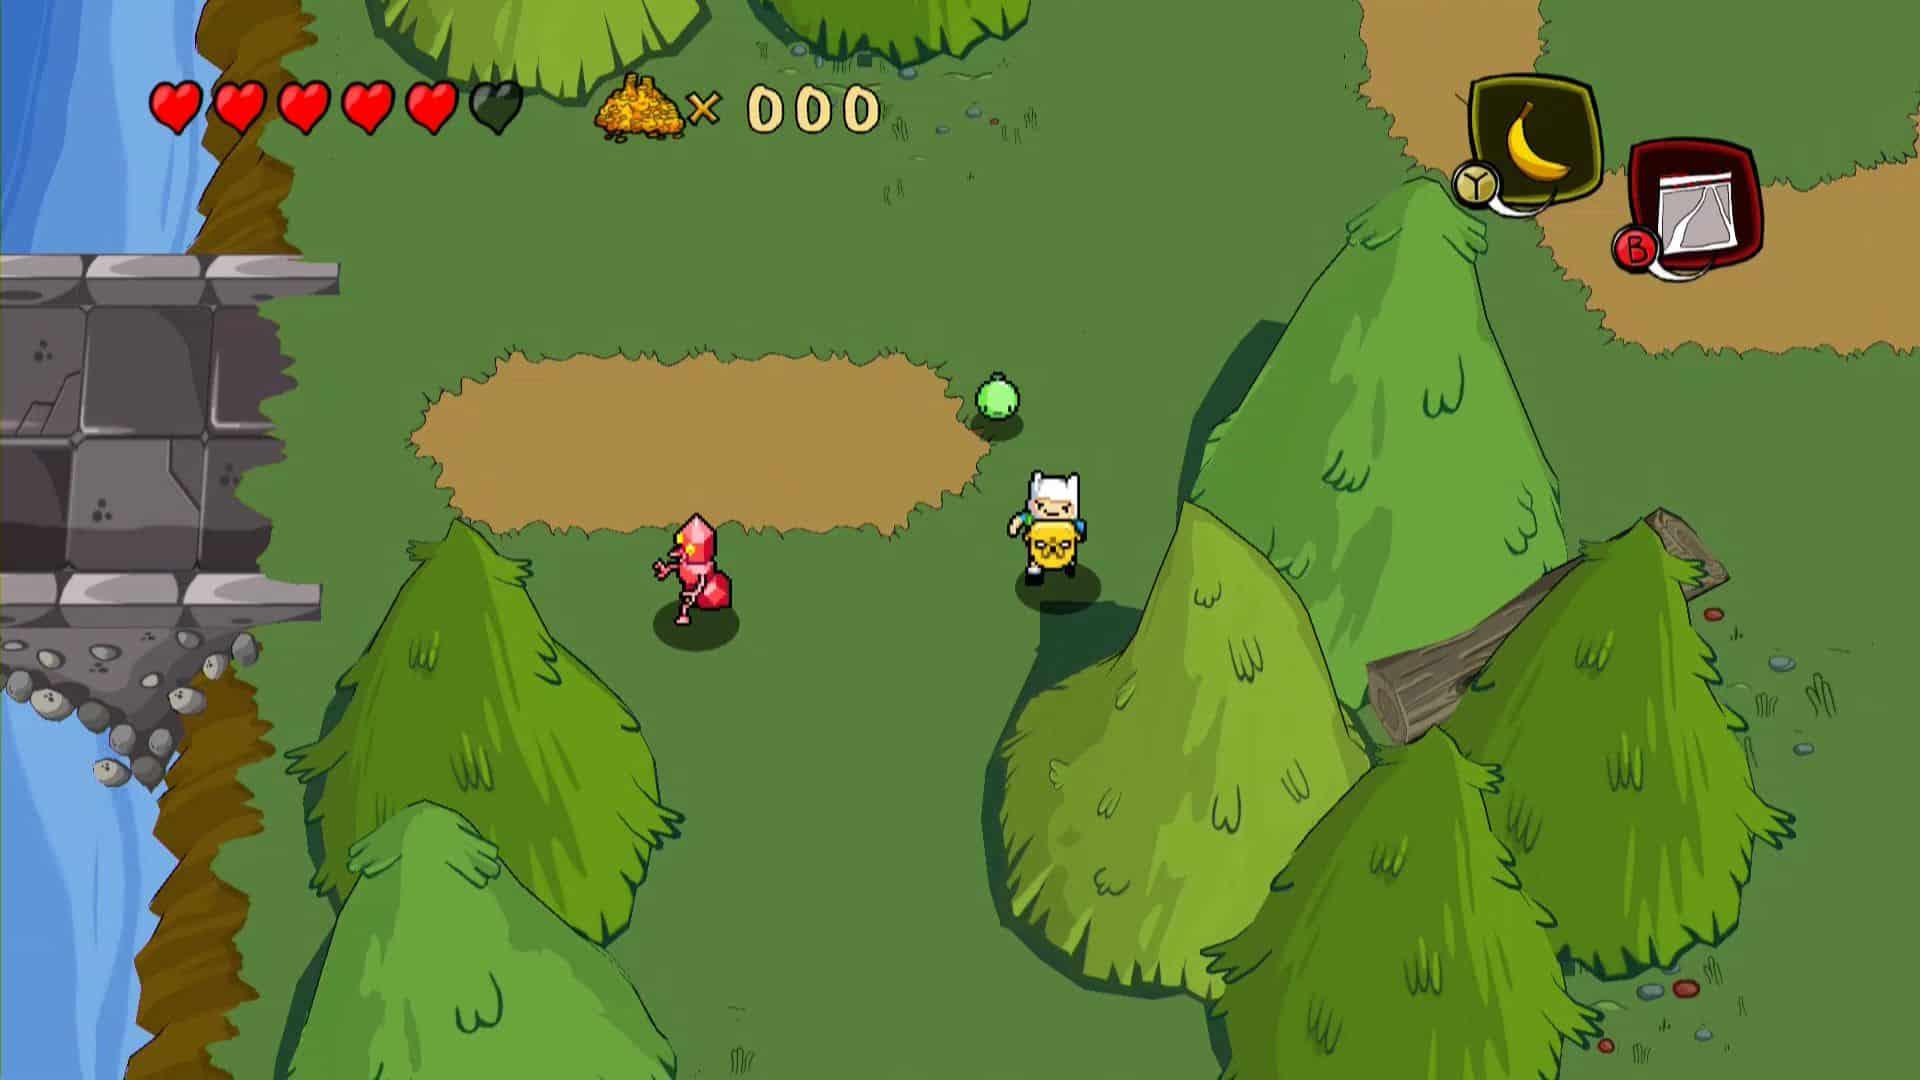 adventure-time-secret-nameless-kingdom-screenshot-1